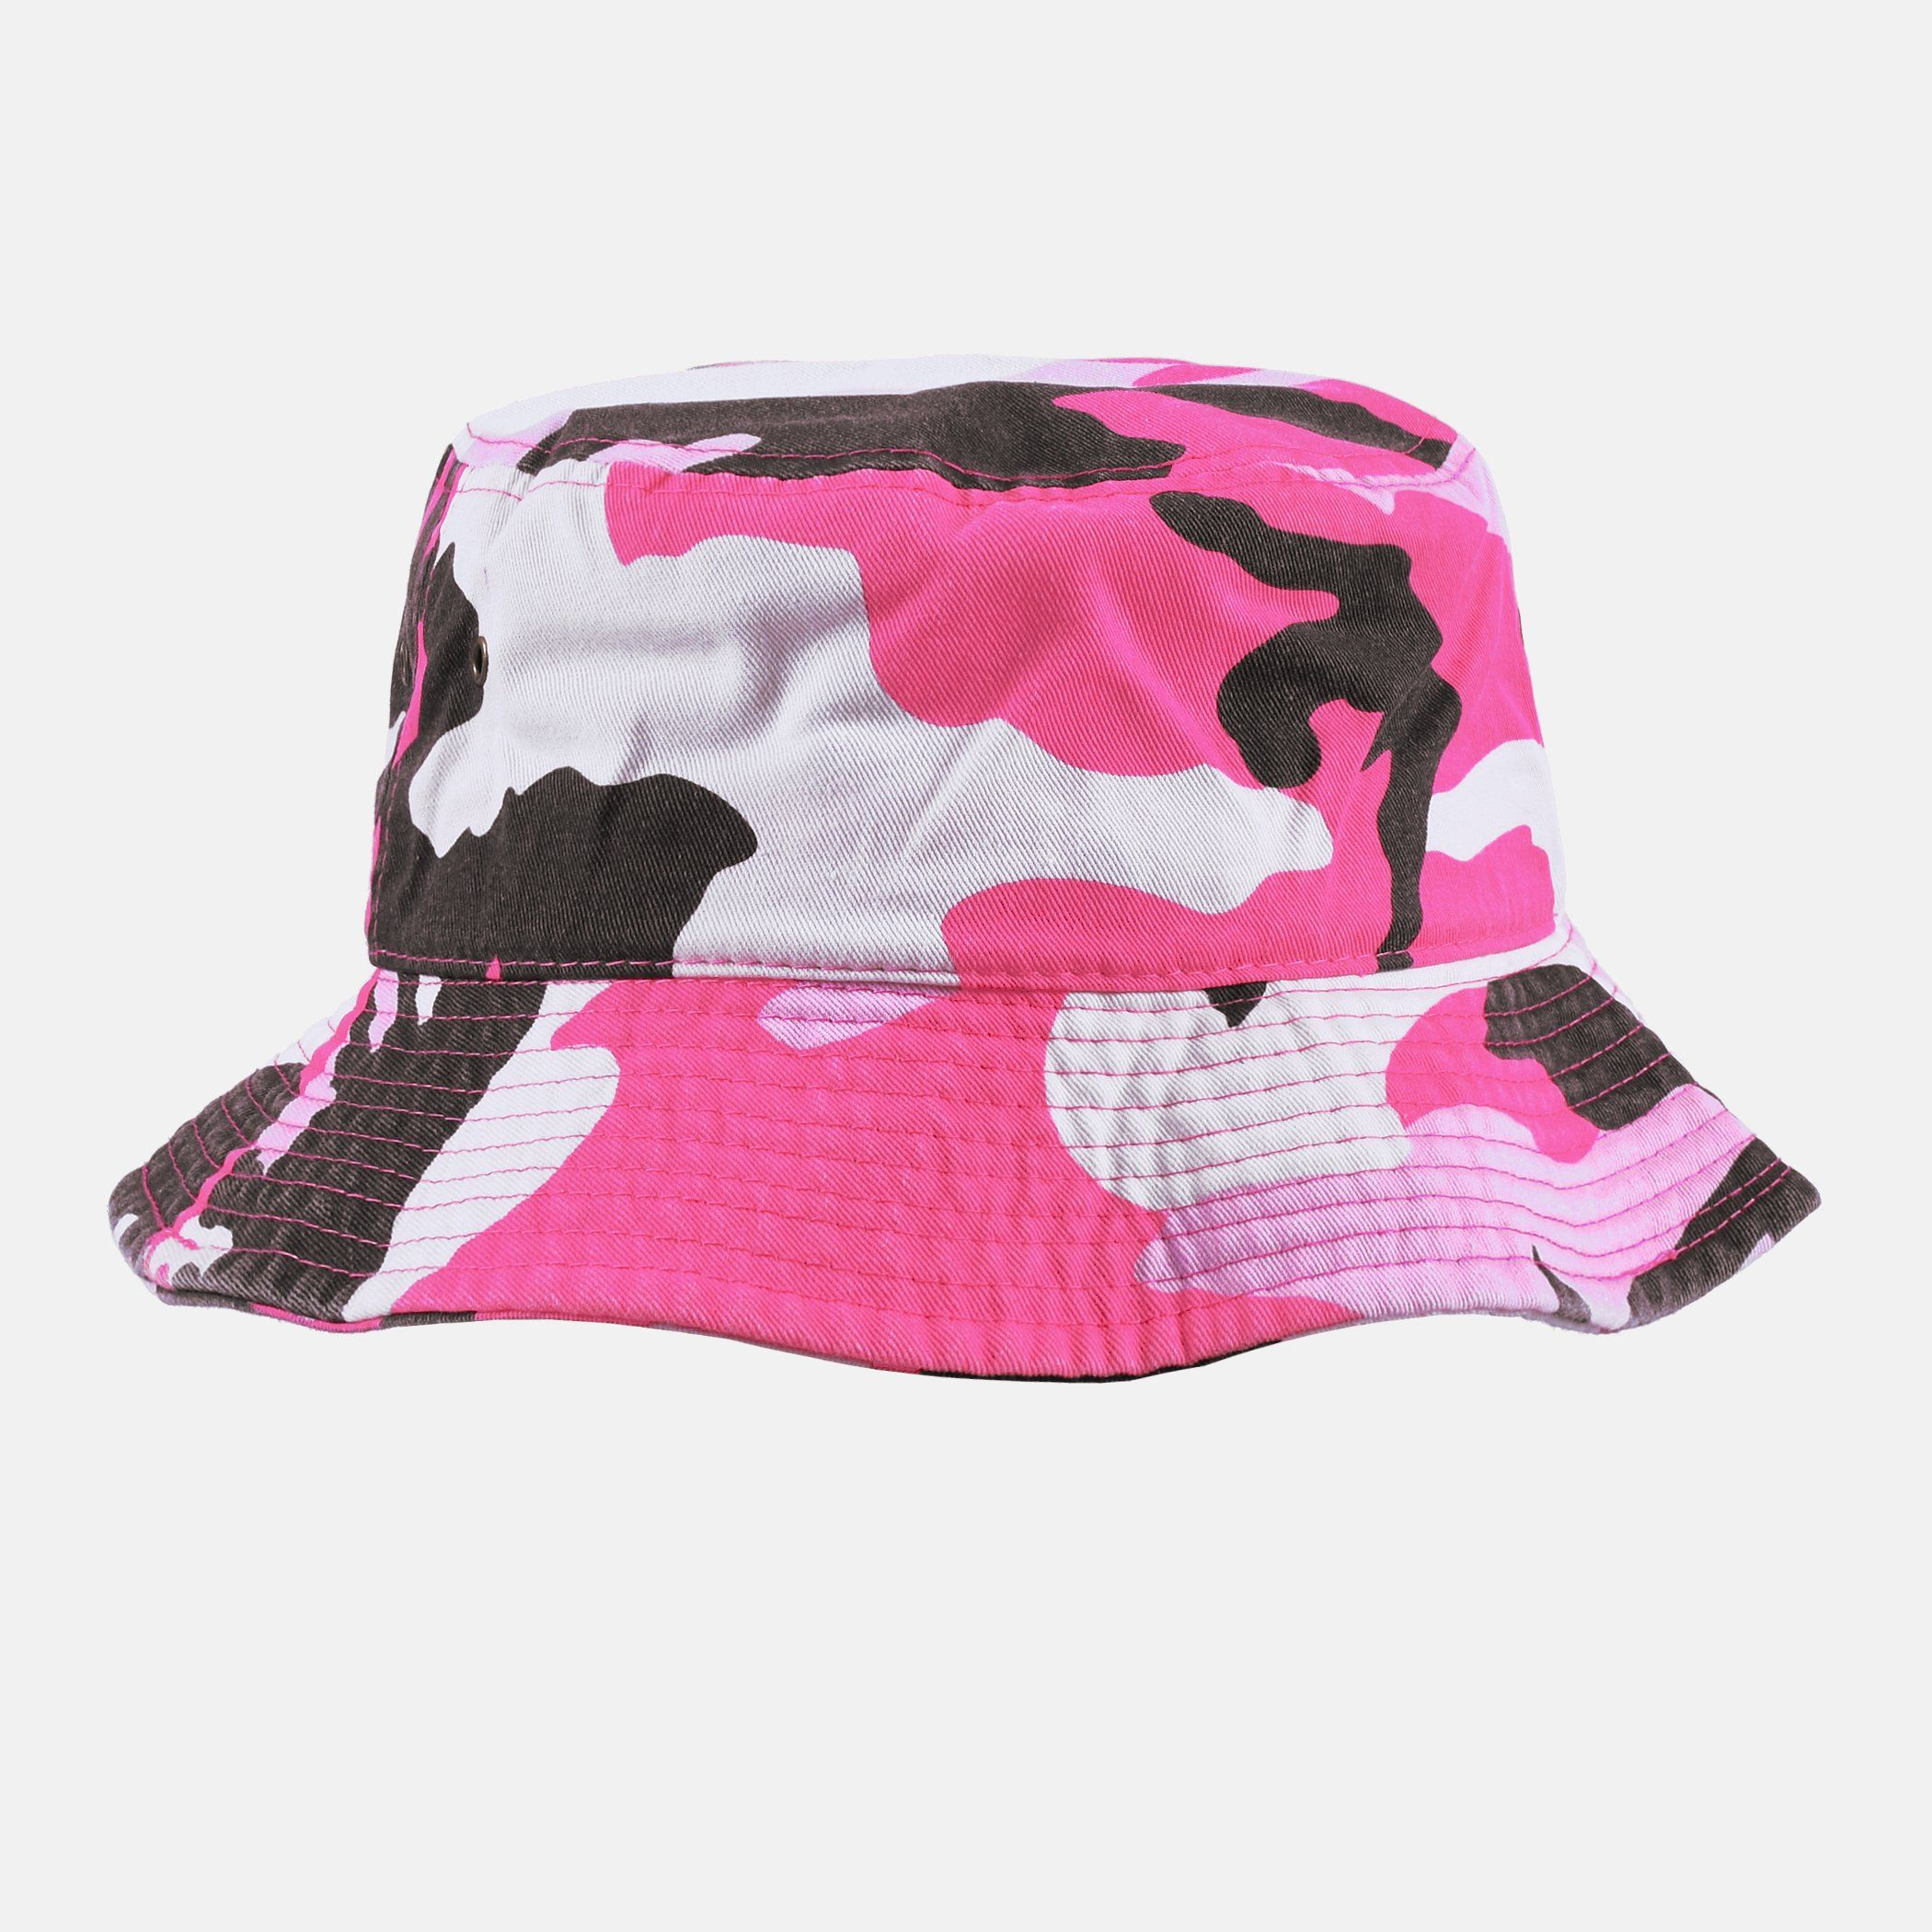 b64306a554c2da Pink Camo Bucket Hat in 2019 | Headwear | Camo bucket hat, Pink camo ...